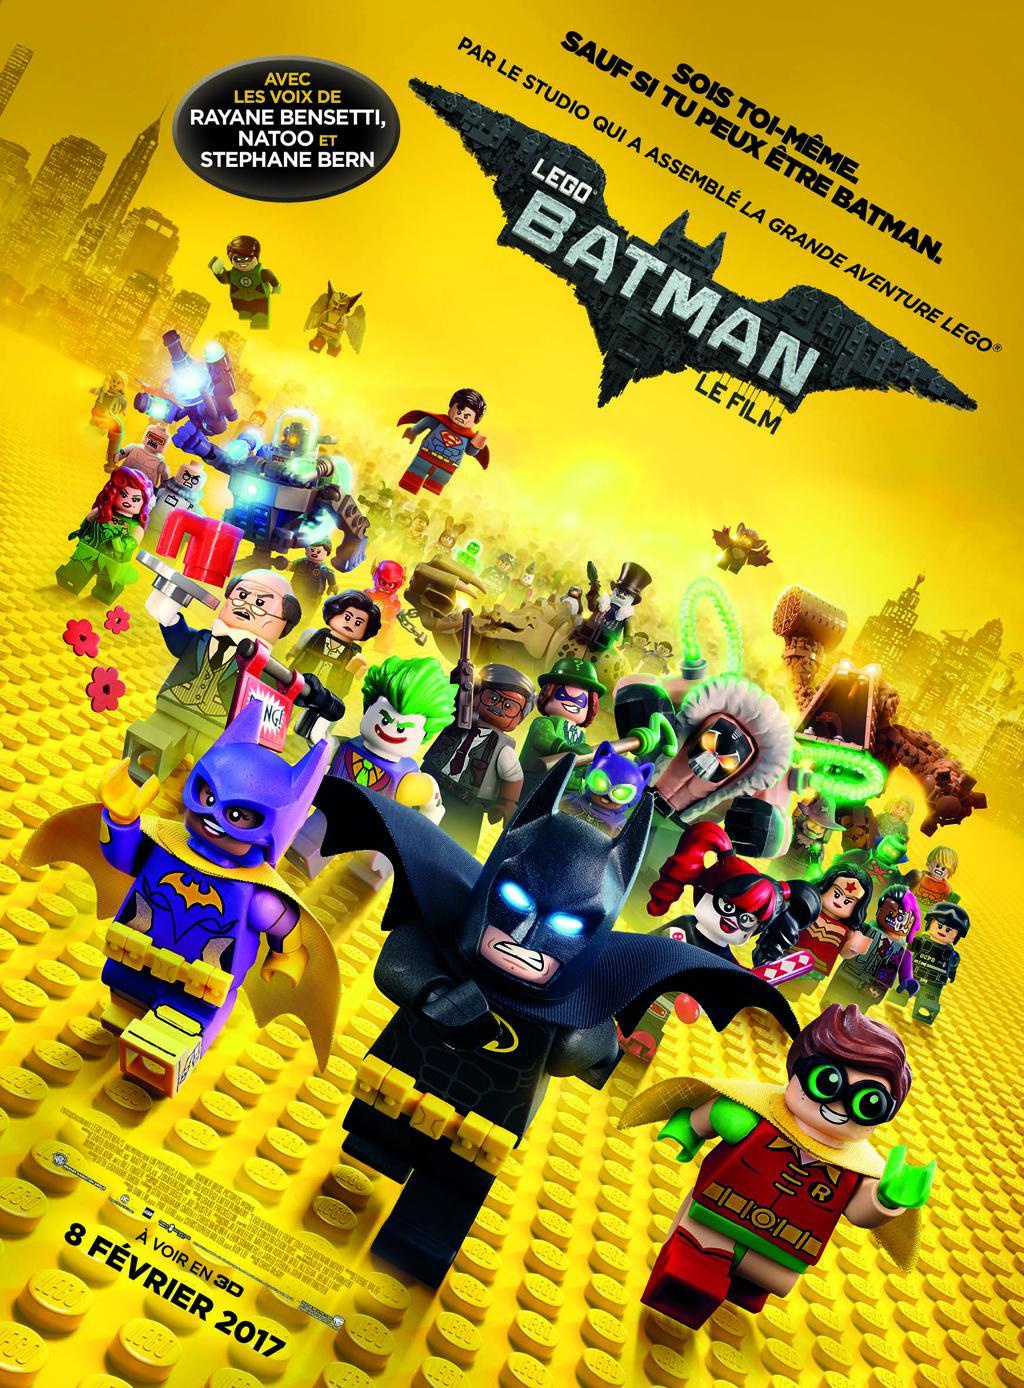 Critique de lego batman le film le spin off de la for Videos de lego batman